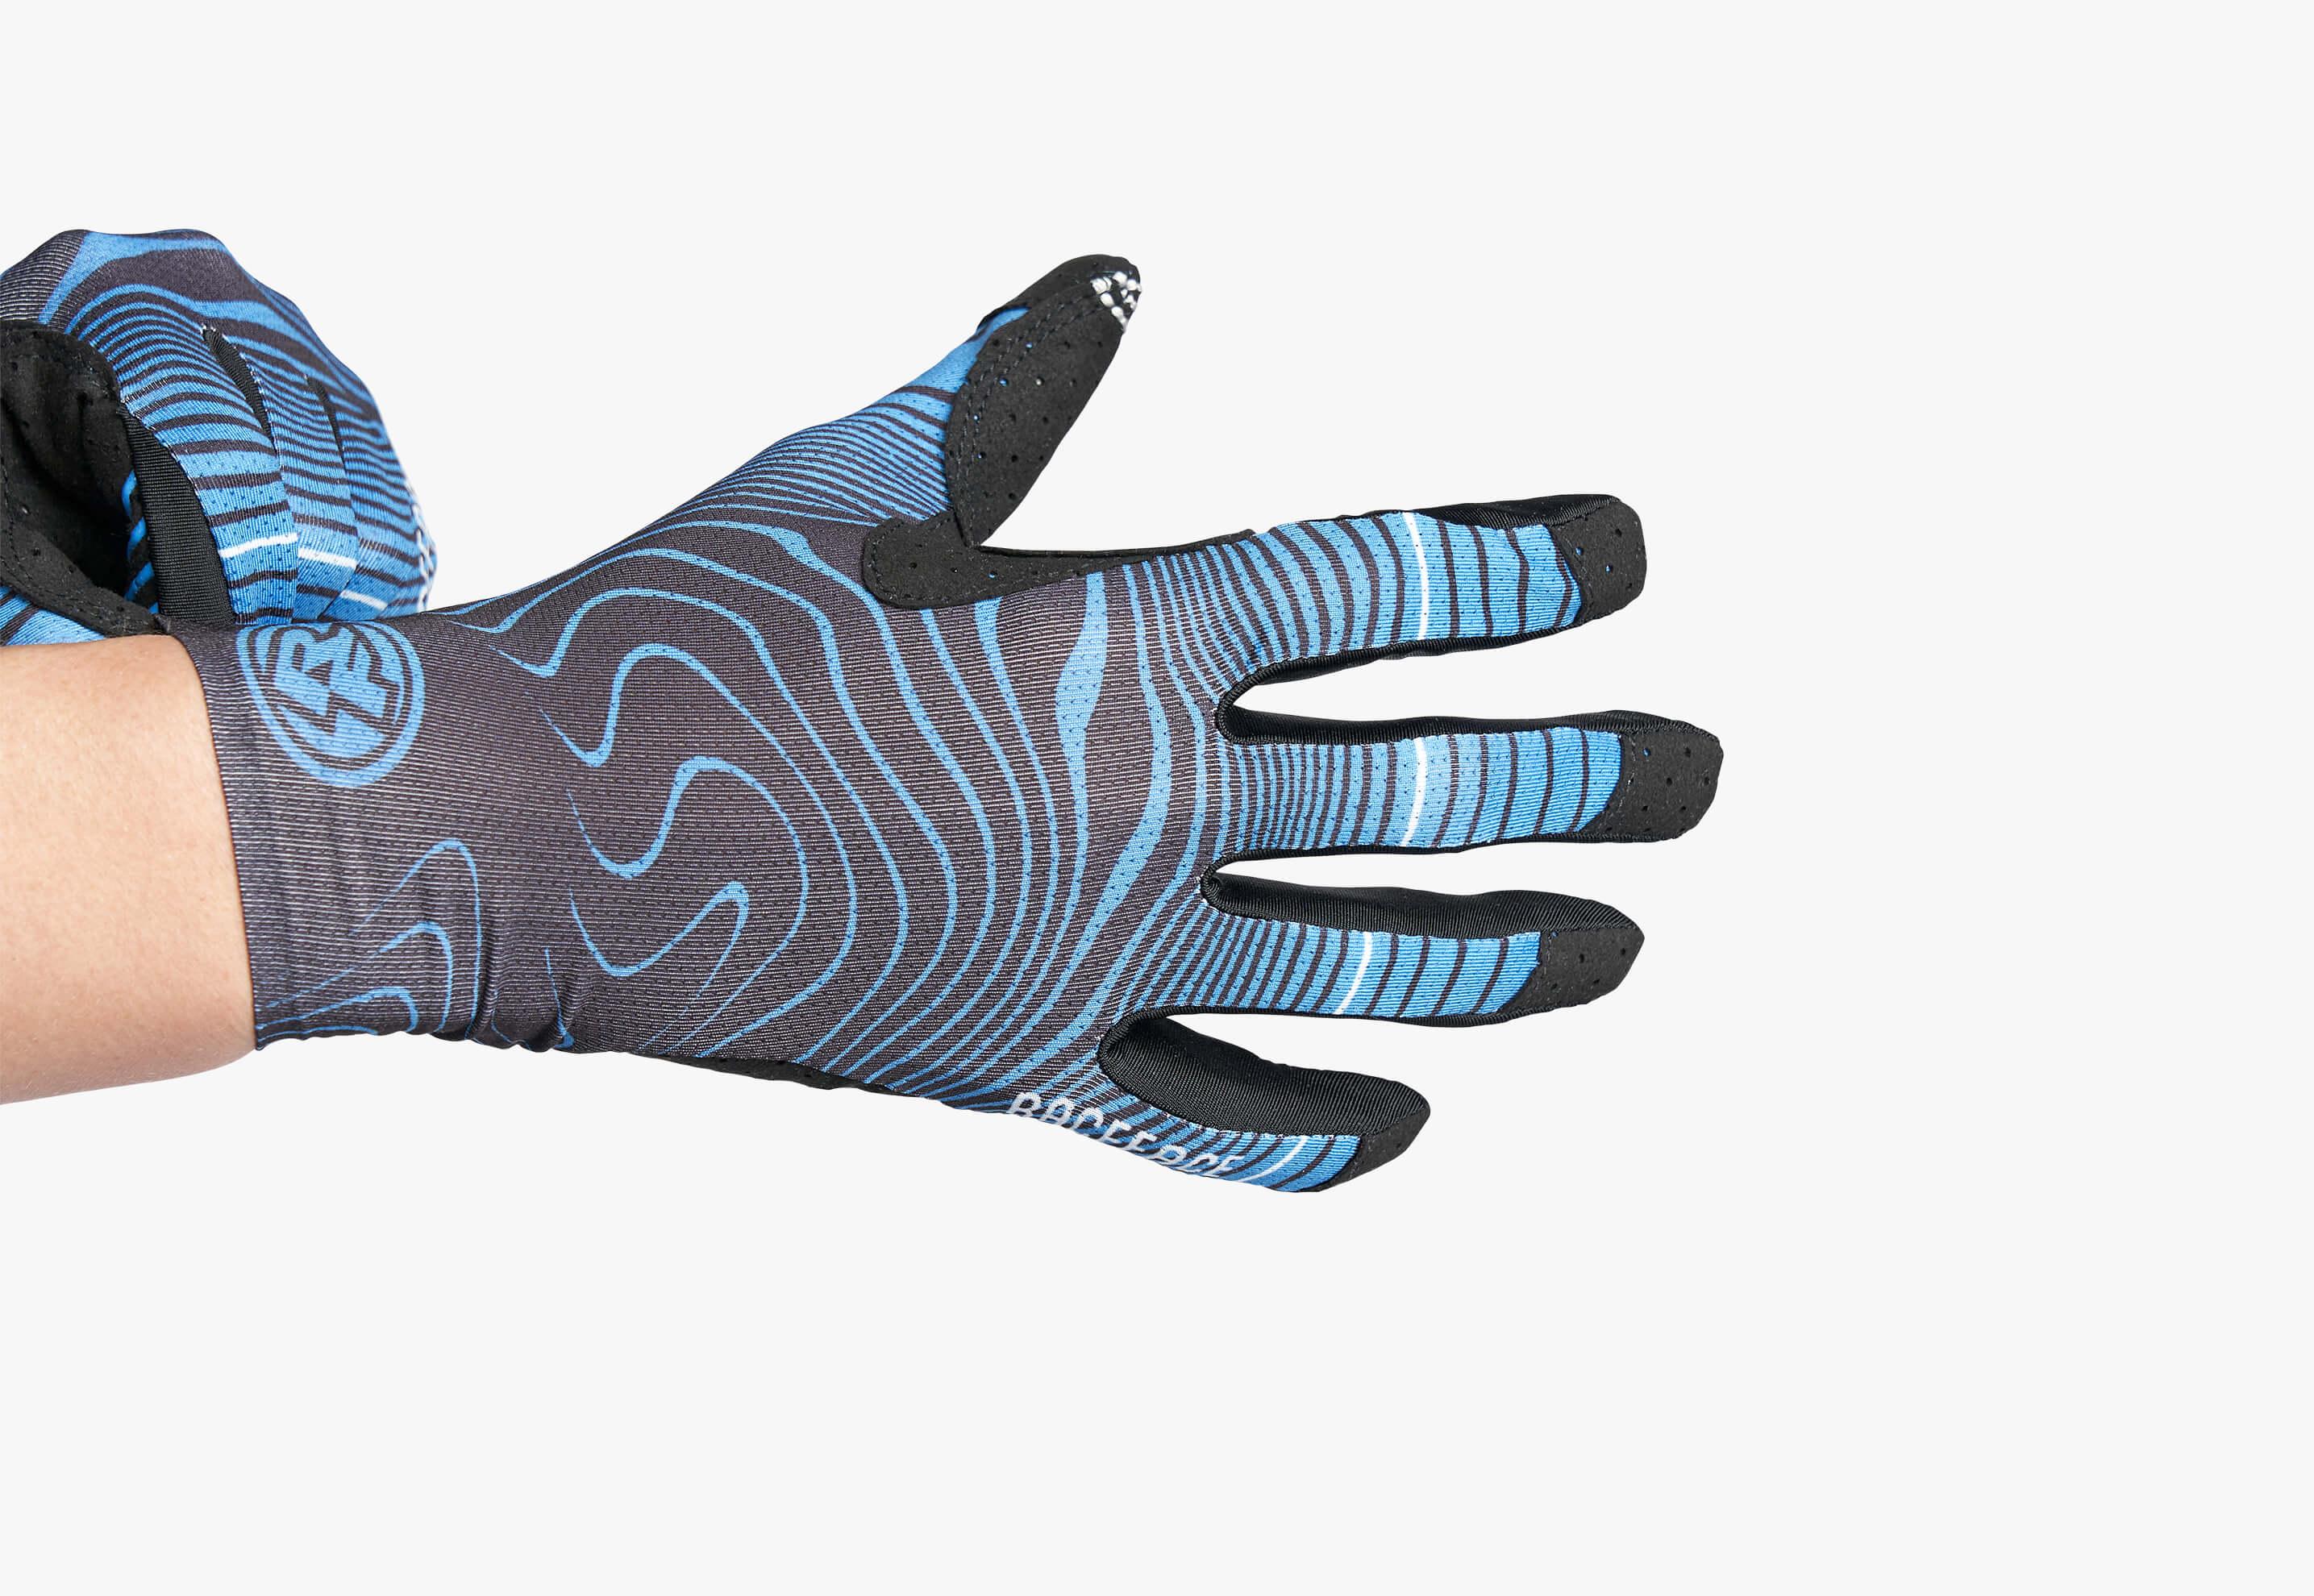 Khyber Glove - Women's